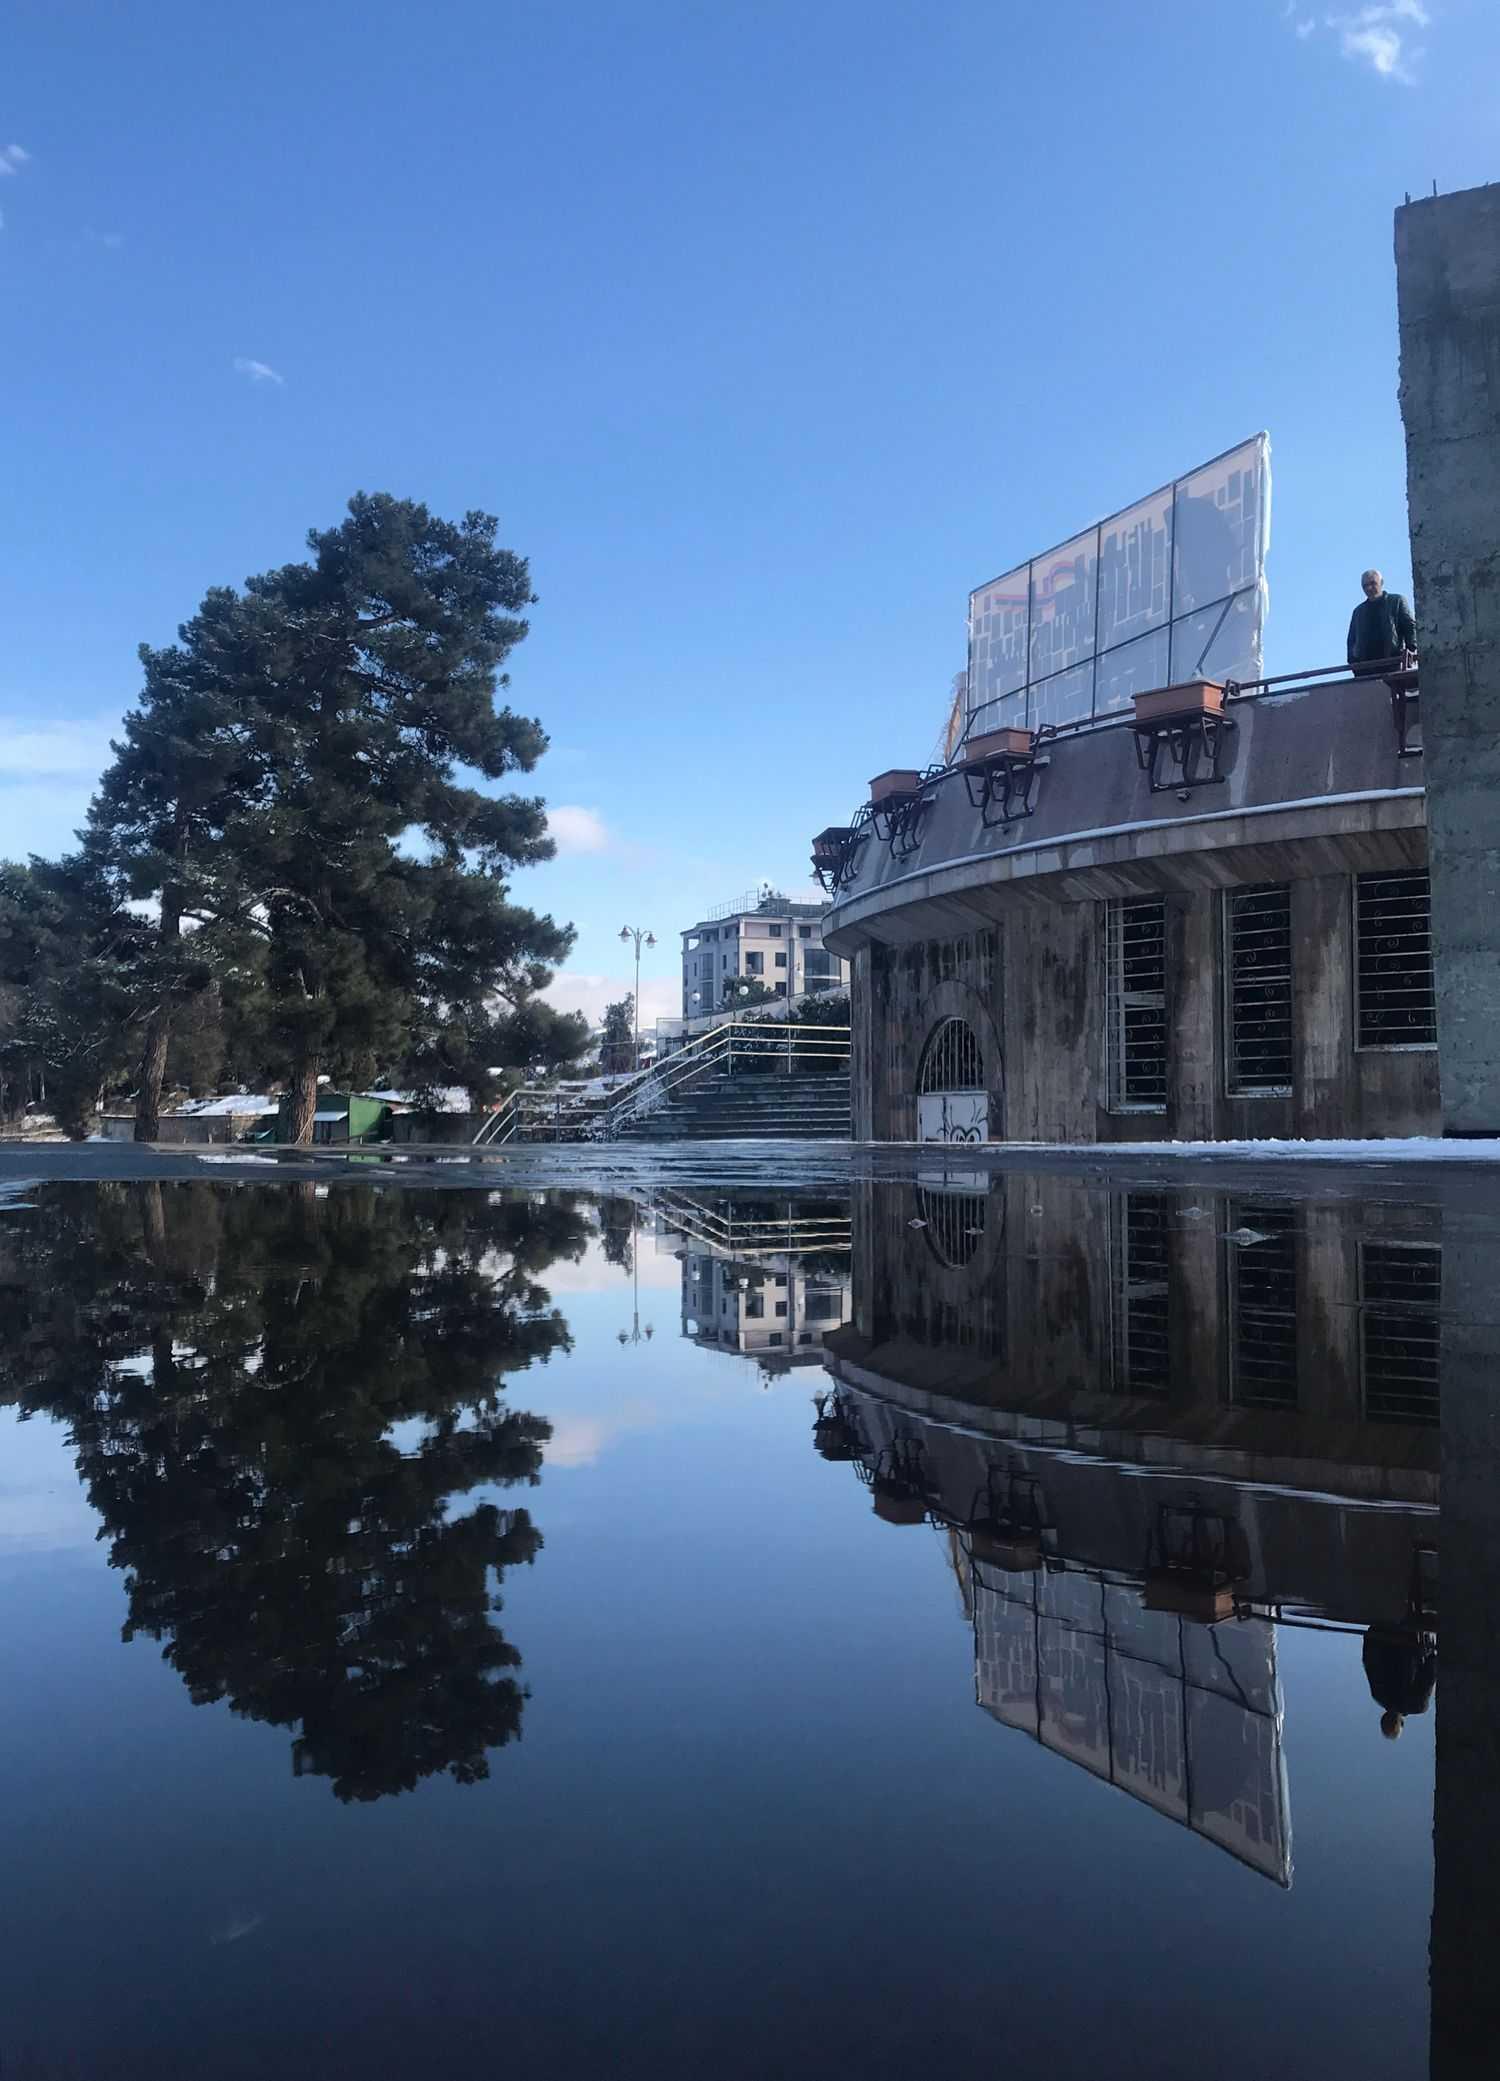 lusine petrosyan 1 - February in Stepanakert